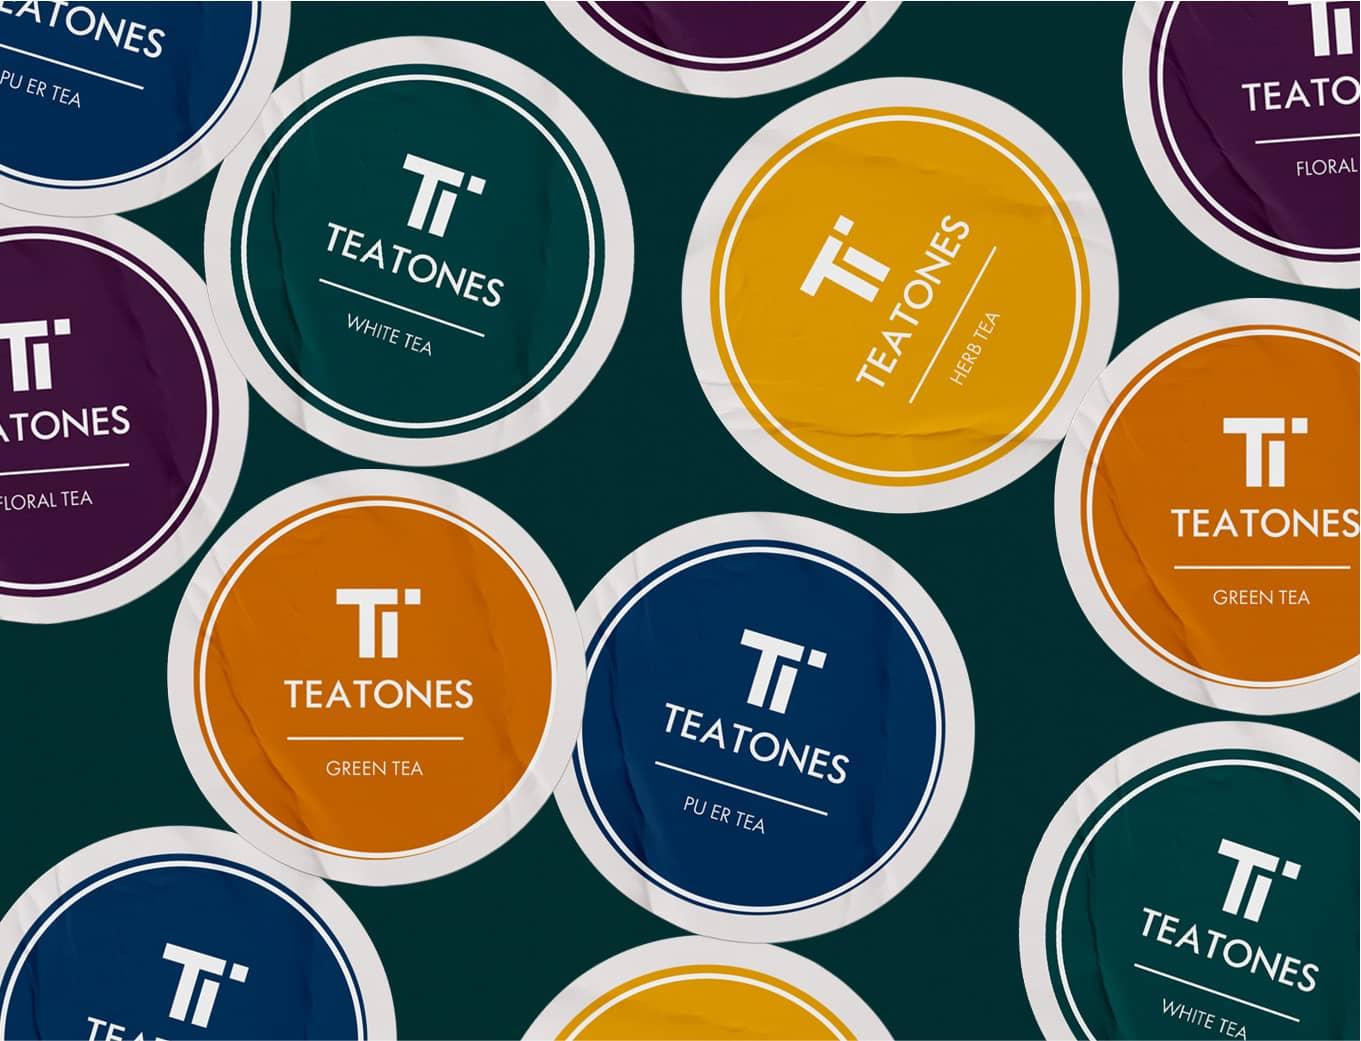 Orange branding Teatone Tea Retail logo tea packaging Design